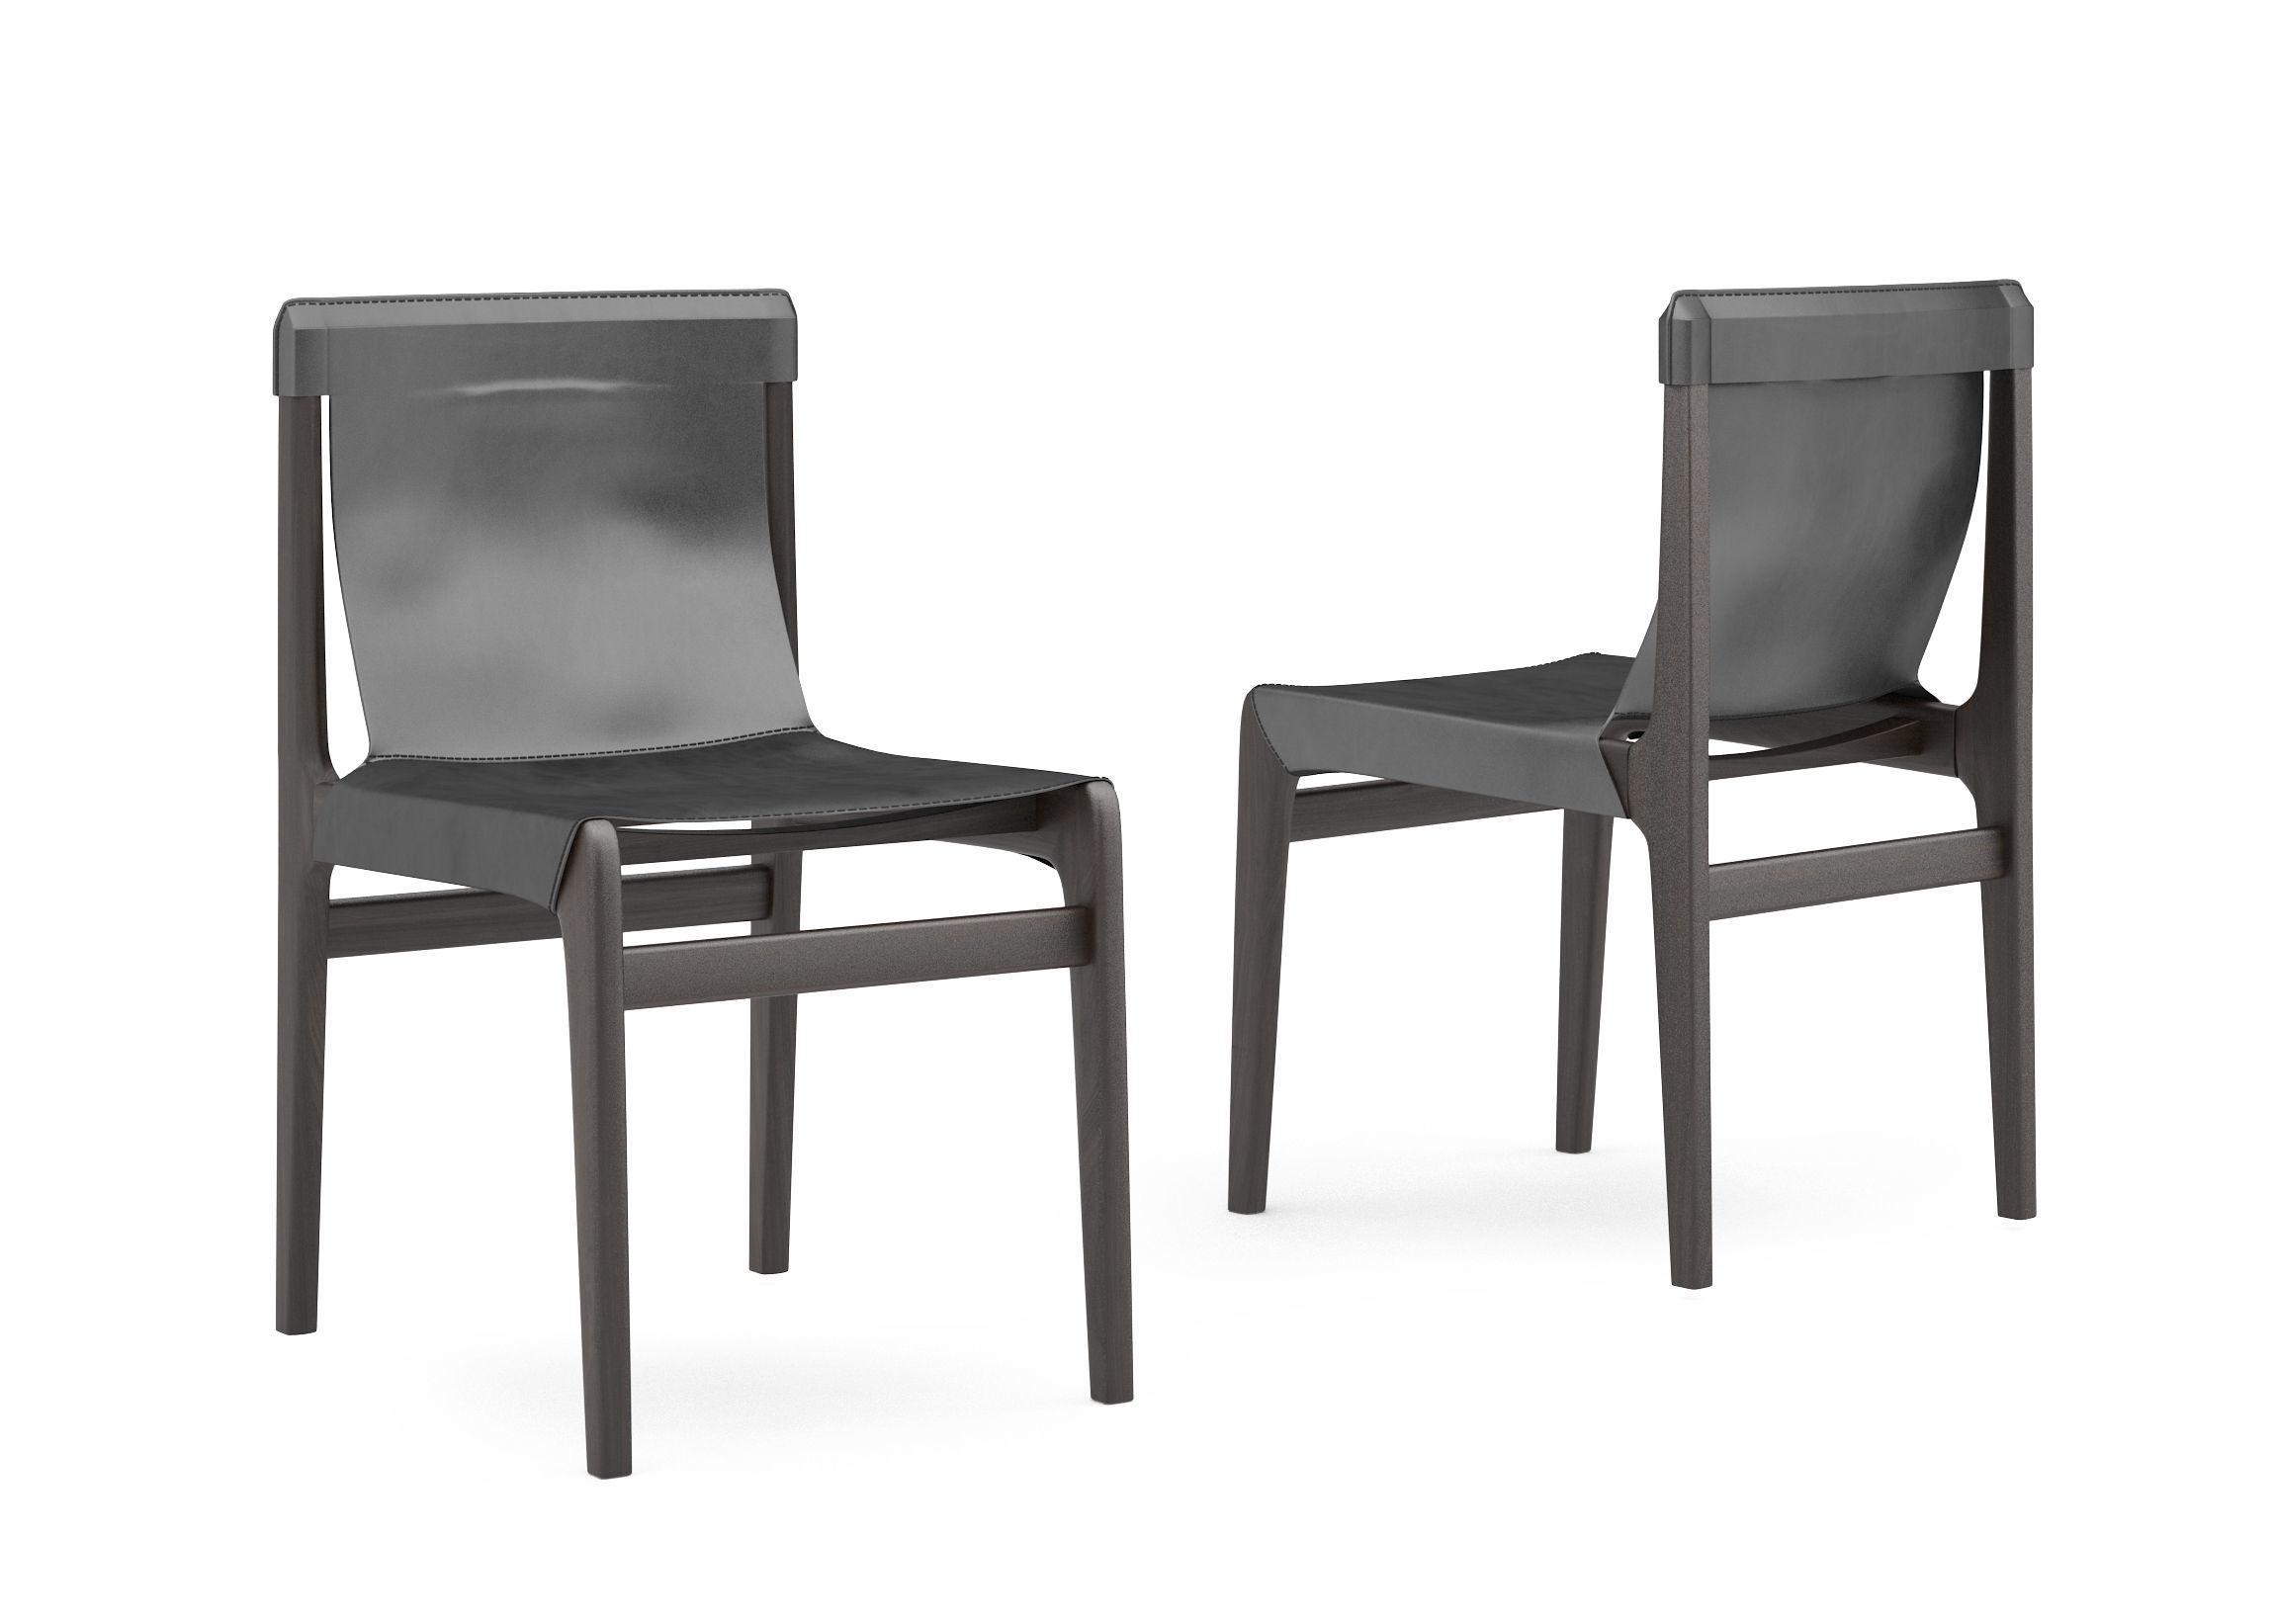 Sensational Cb2 Burano Leather Sling Chair 3D Model Uwap Interior Chair Design Uwaporg